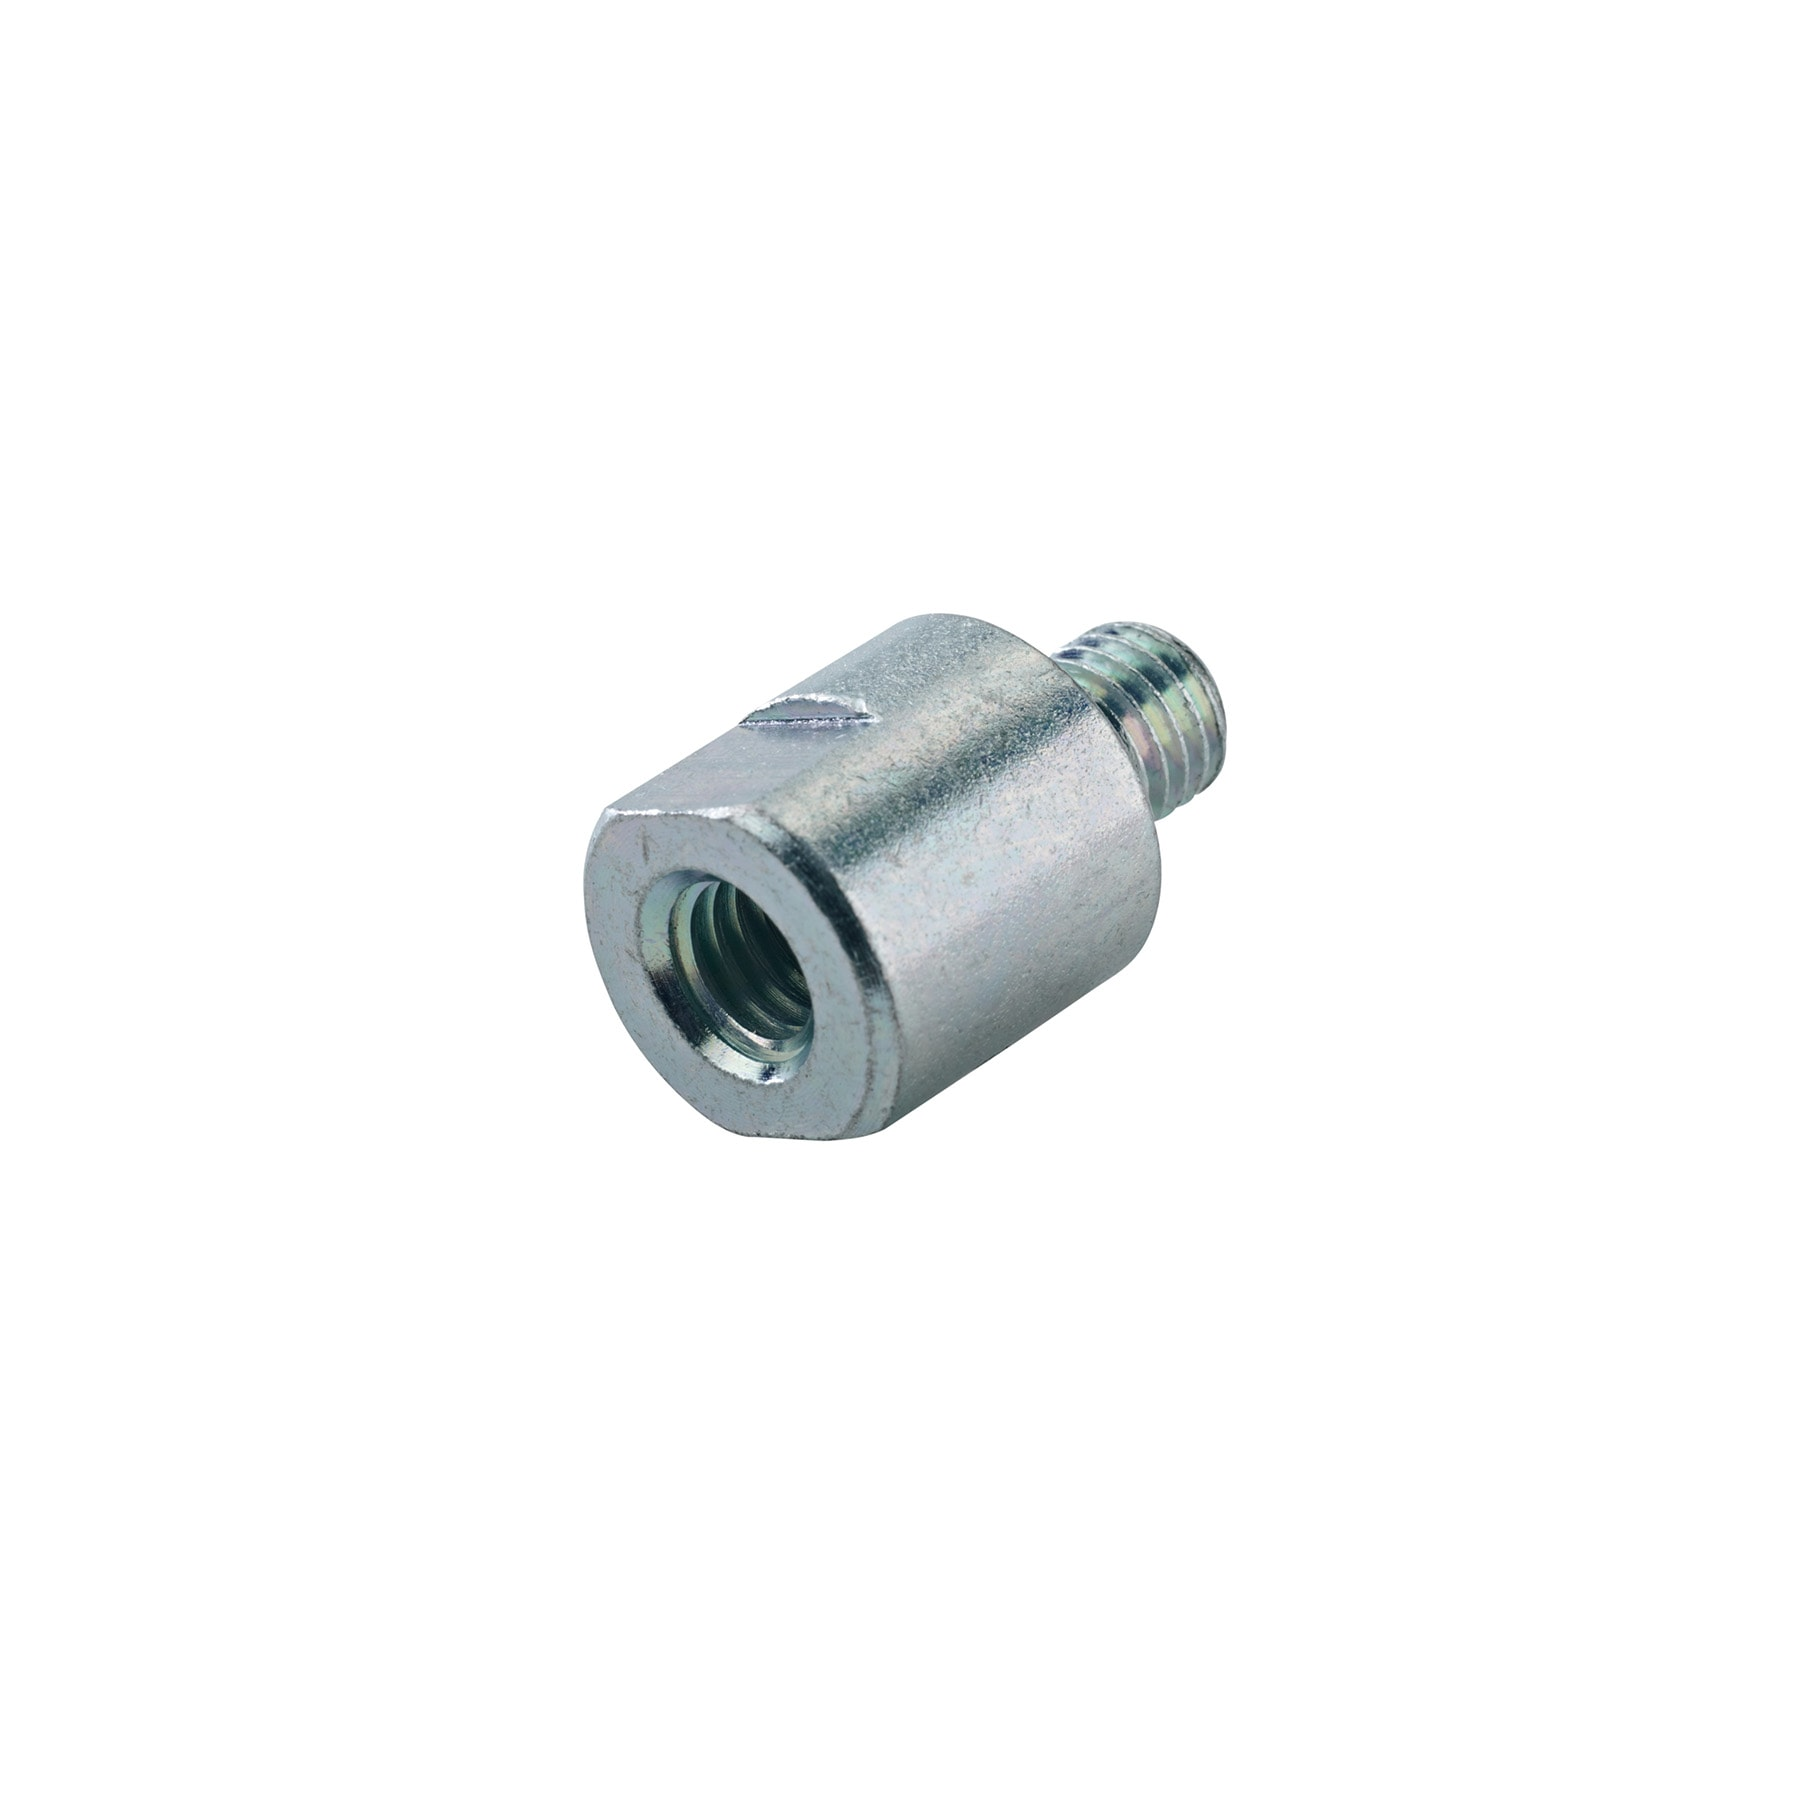 KM21980 - Thread adapter